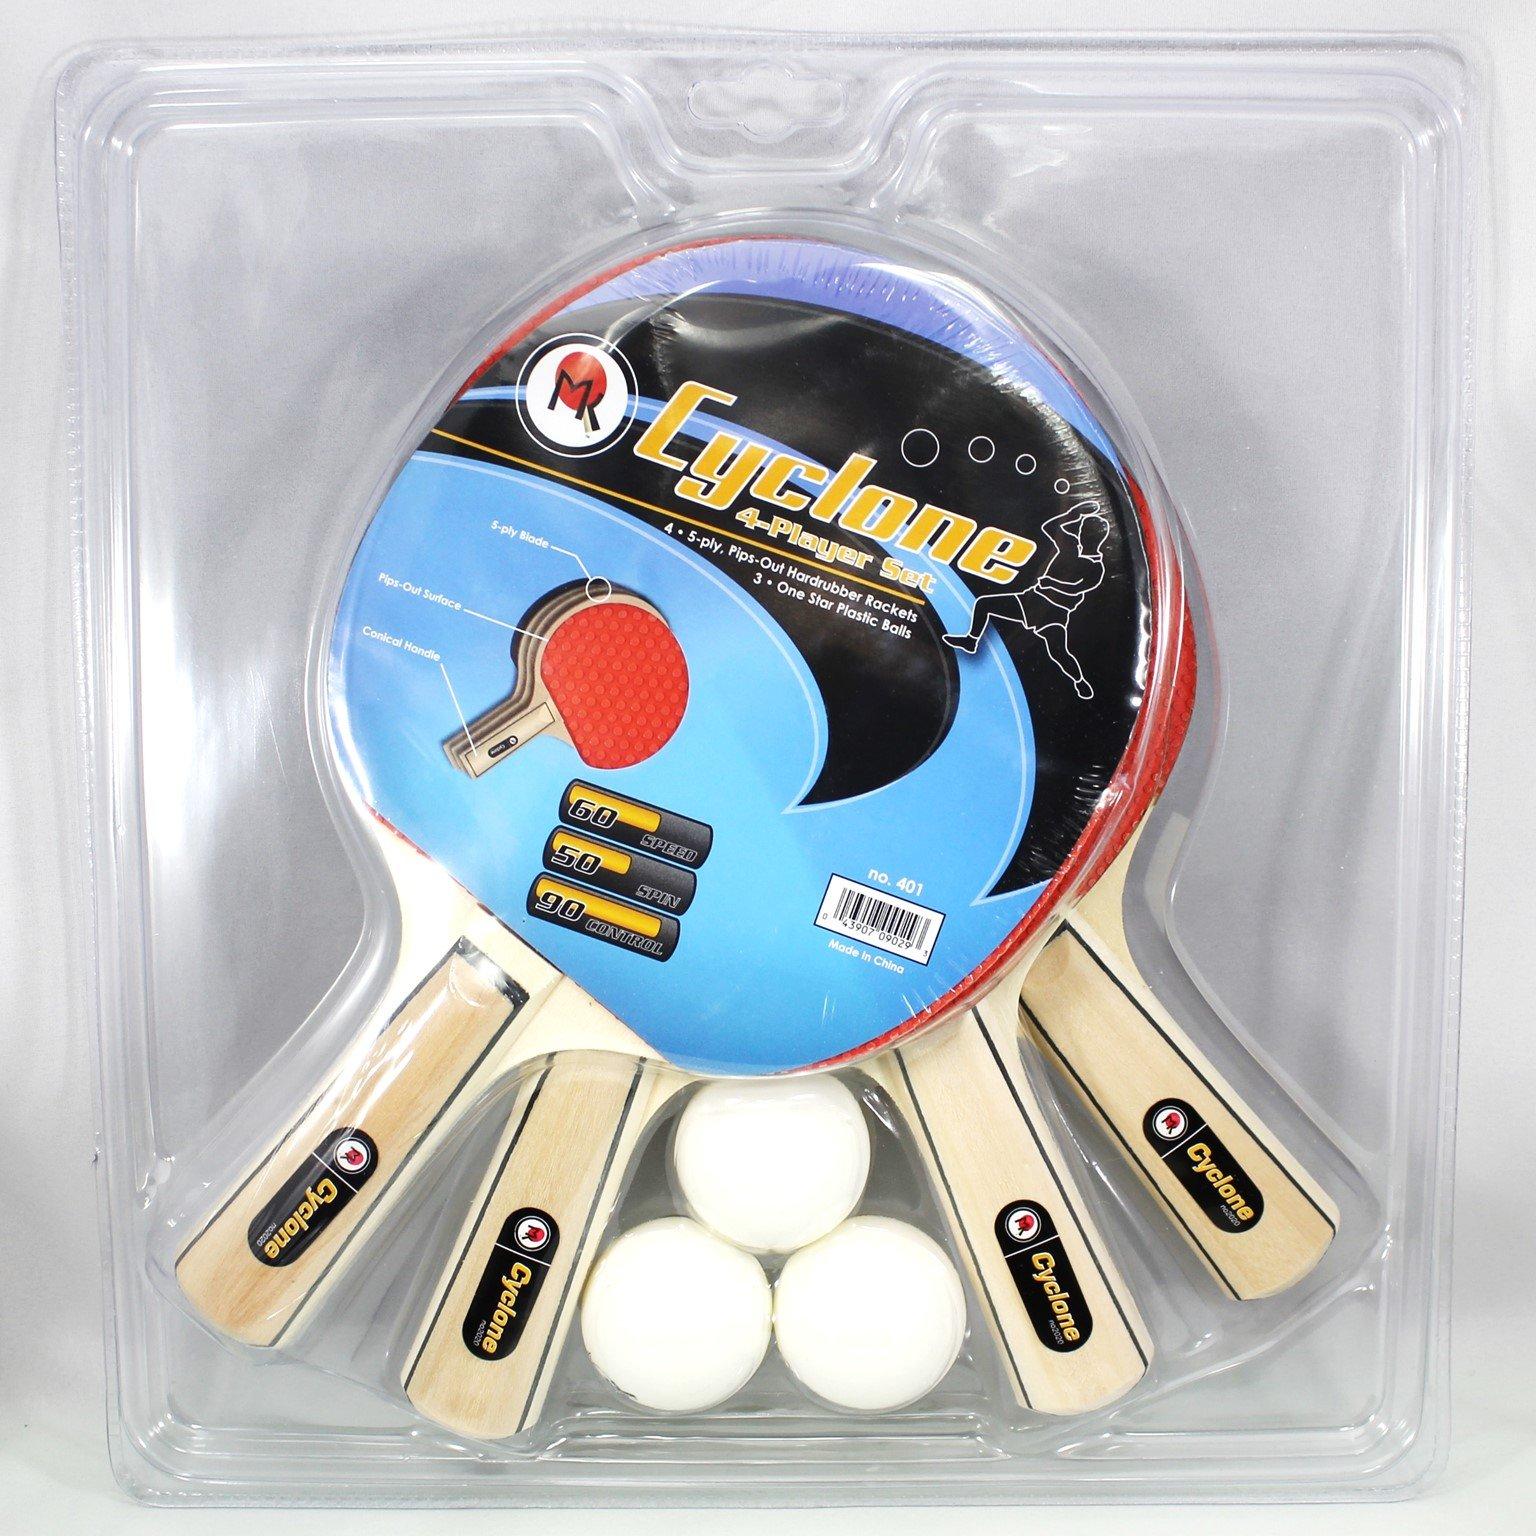 Martin Kilpatrick Cyclone 4 Player Table Tennis Racket Set - 4 Paddles - 3 Ping Pong Balls - Net Set